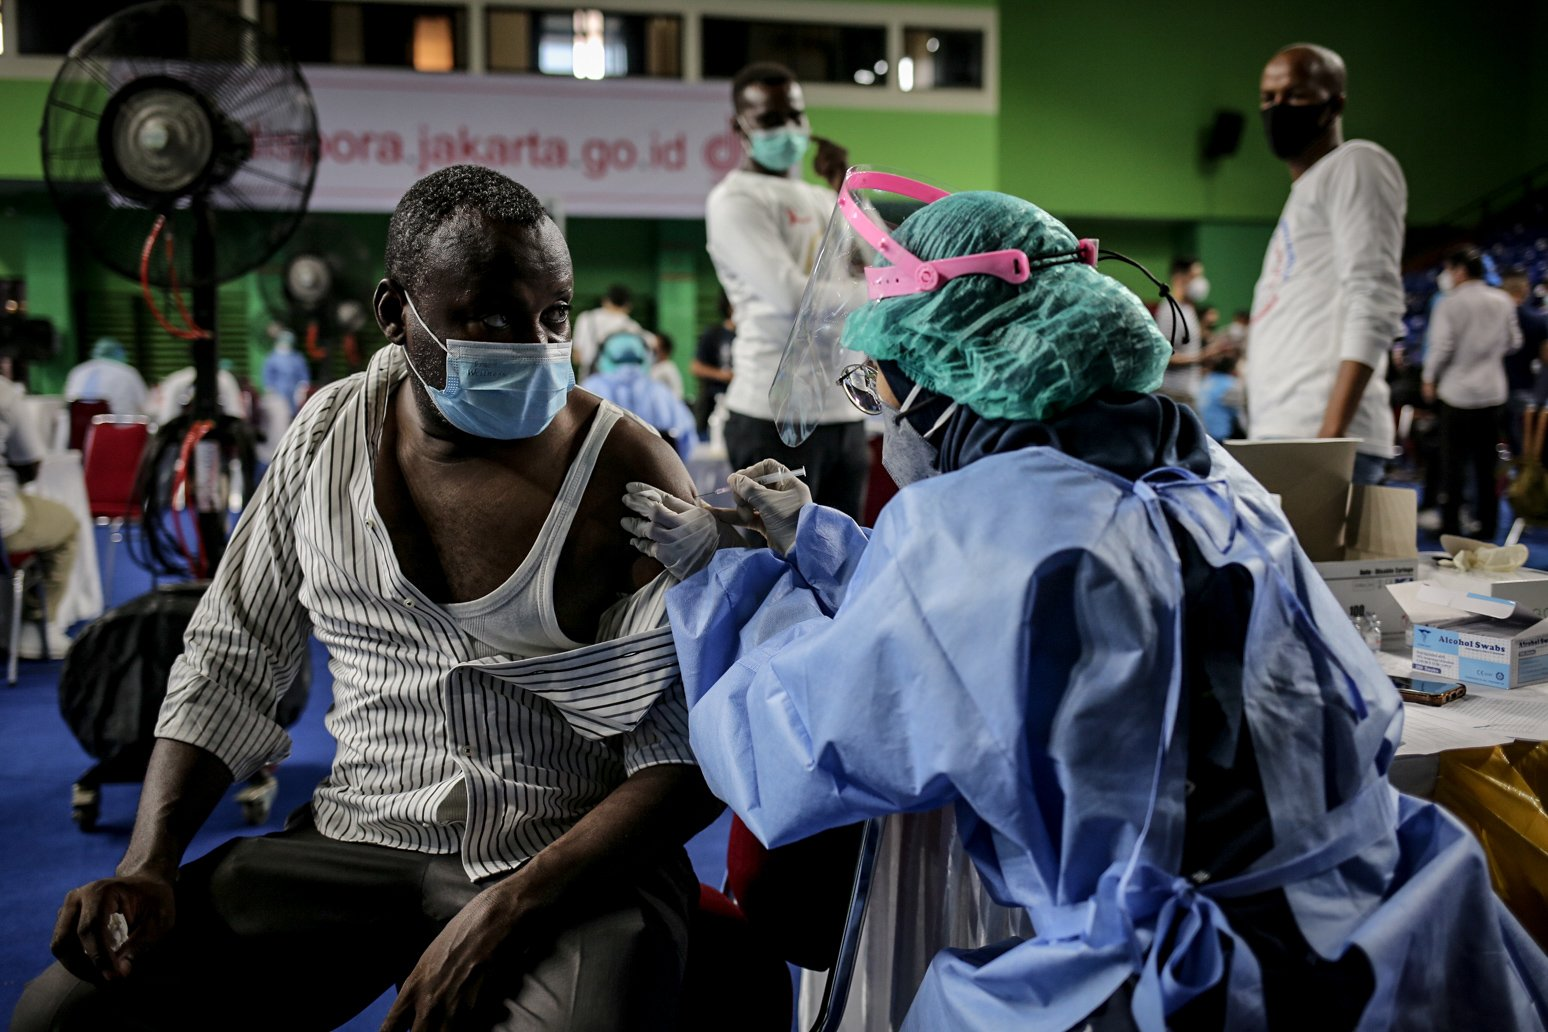 Seorang pencari suaka membuka bajunya saat disuntikkan vaksinasi COVID-19 di GOR Bulungan, Jakarta Selatan, Kamis (7/10/2021). Vaksinasi tersebut digelar atas kerja sama Pemprov DKI Jakarta, UNHCR dan Kadin Indonesia. Sebanyak 600 vaksin dosis pertama disediakan dalam vaksinasi tersebut.